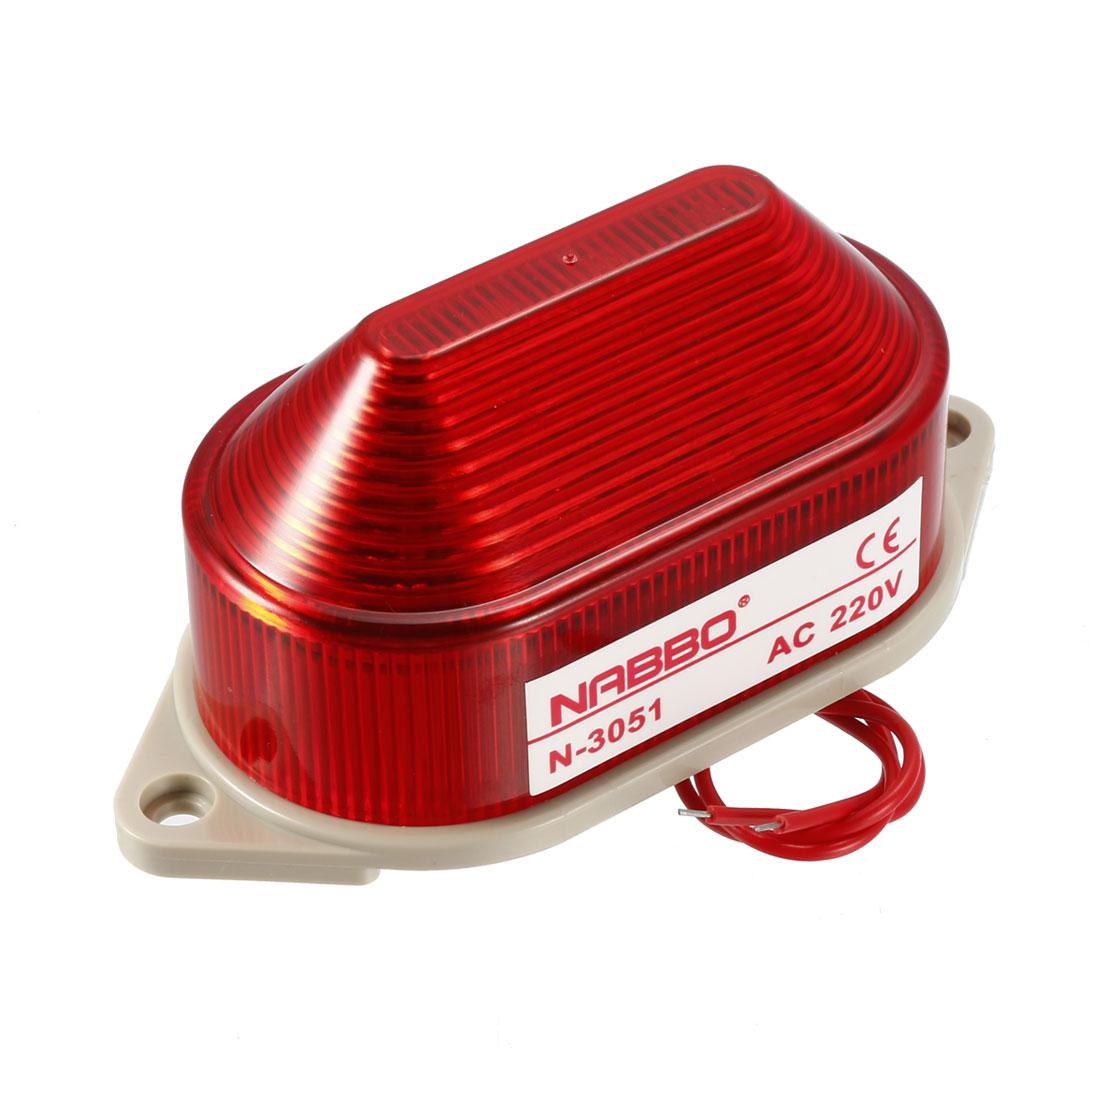 Industrial AC 220V Mini Red LED Strobe Flash Warning Light Bulb Tower Lamp